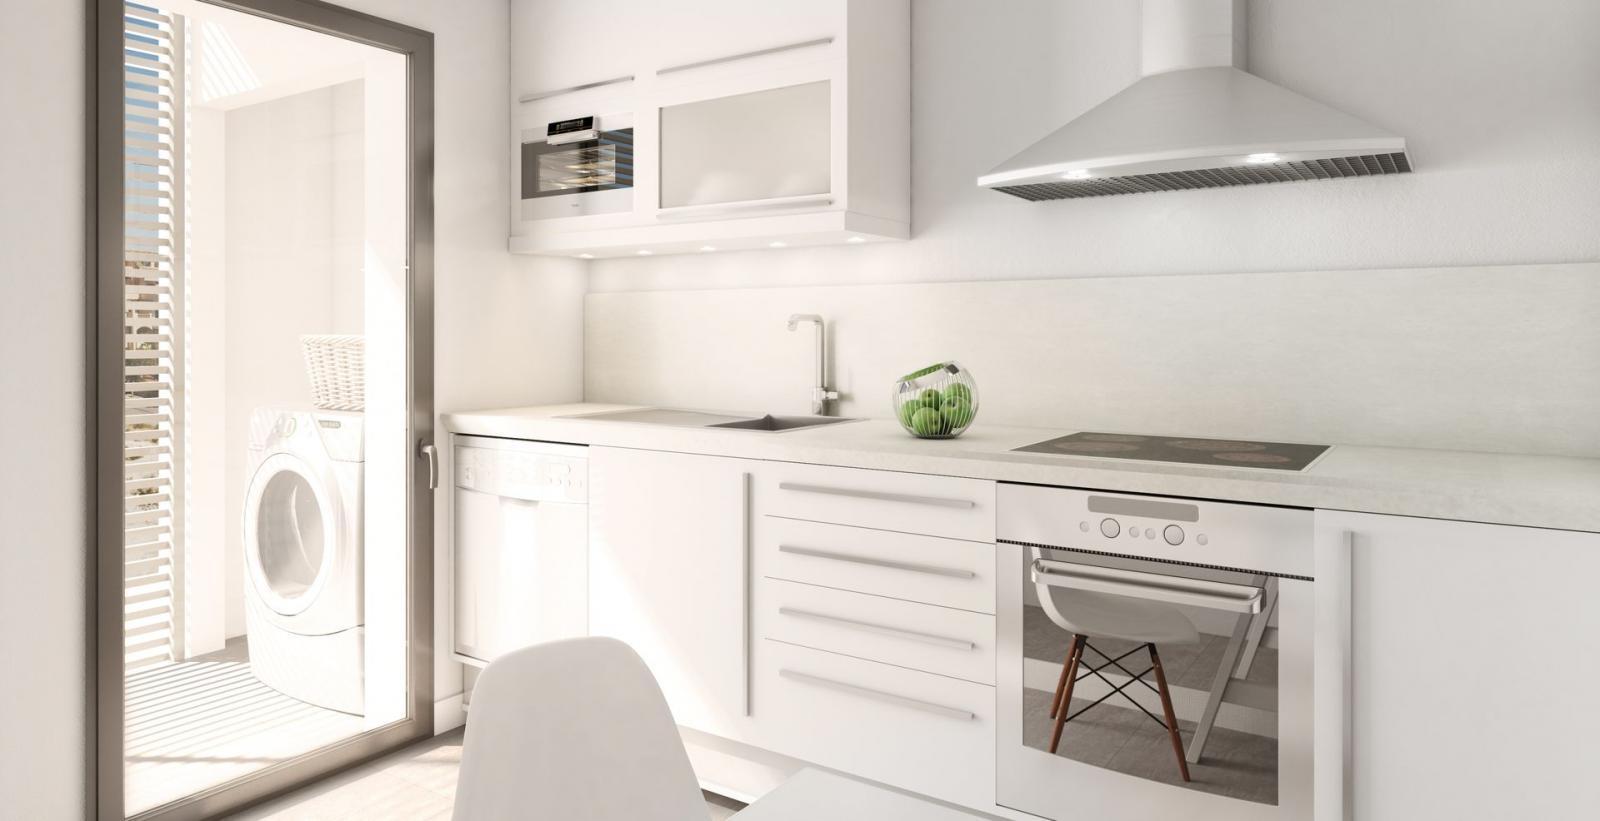 Apartment for sale in Benalmádena